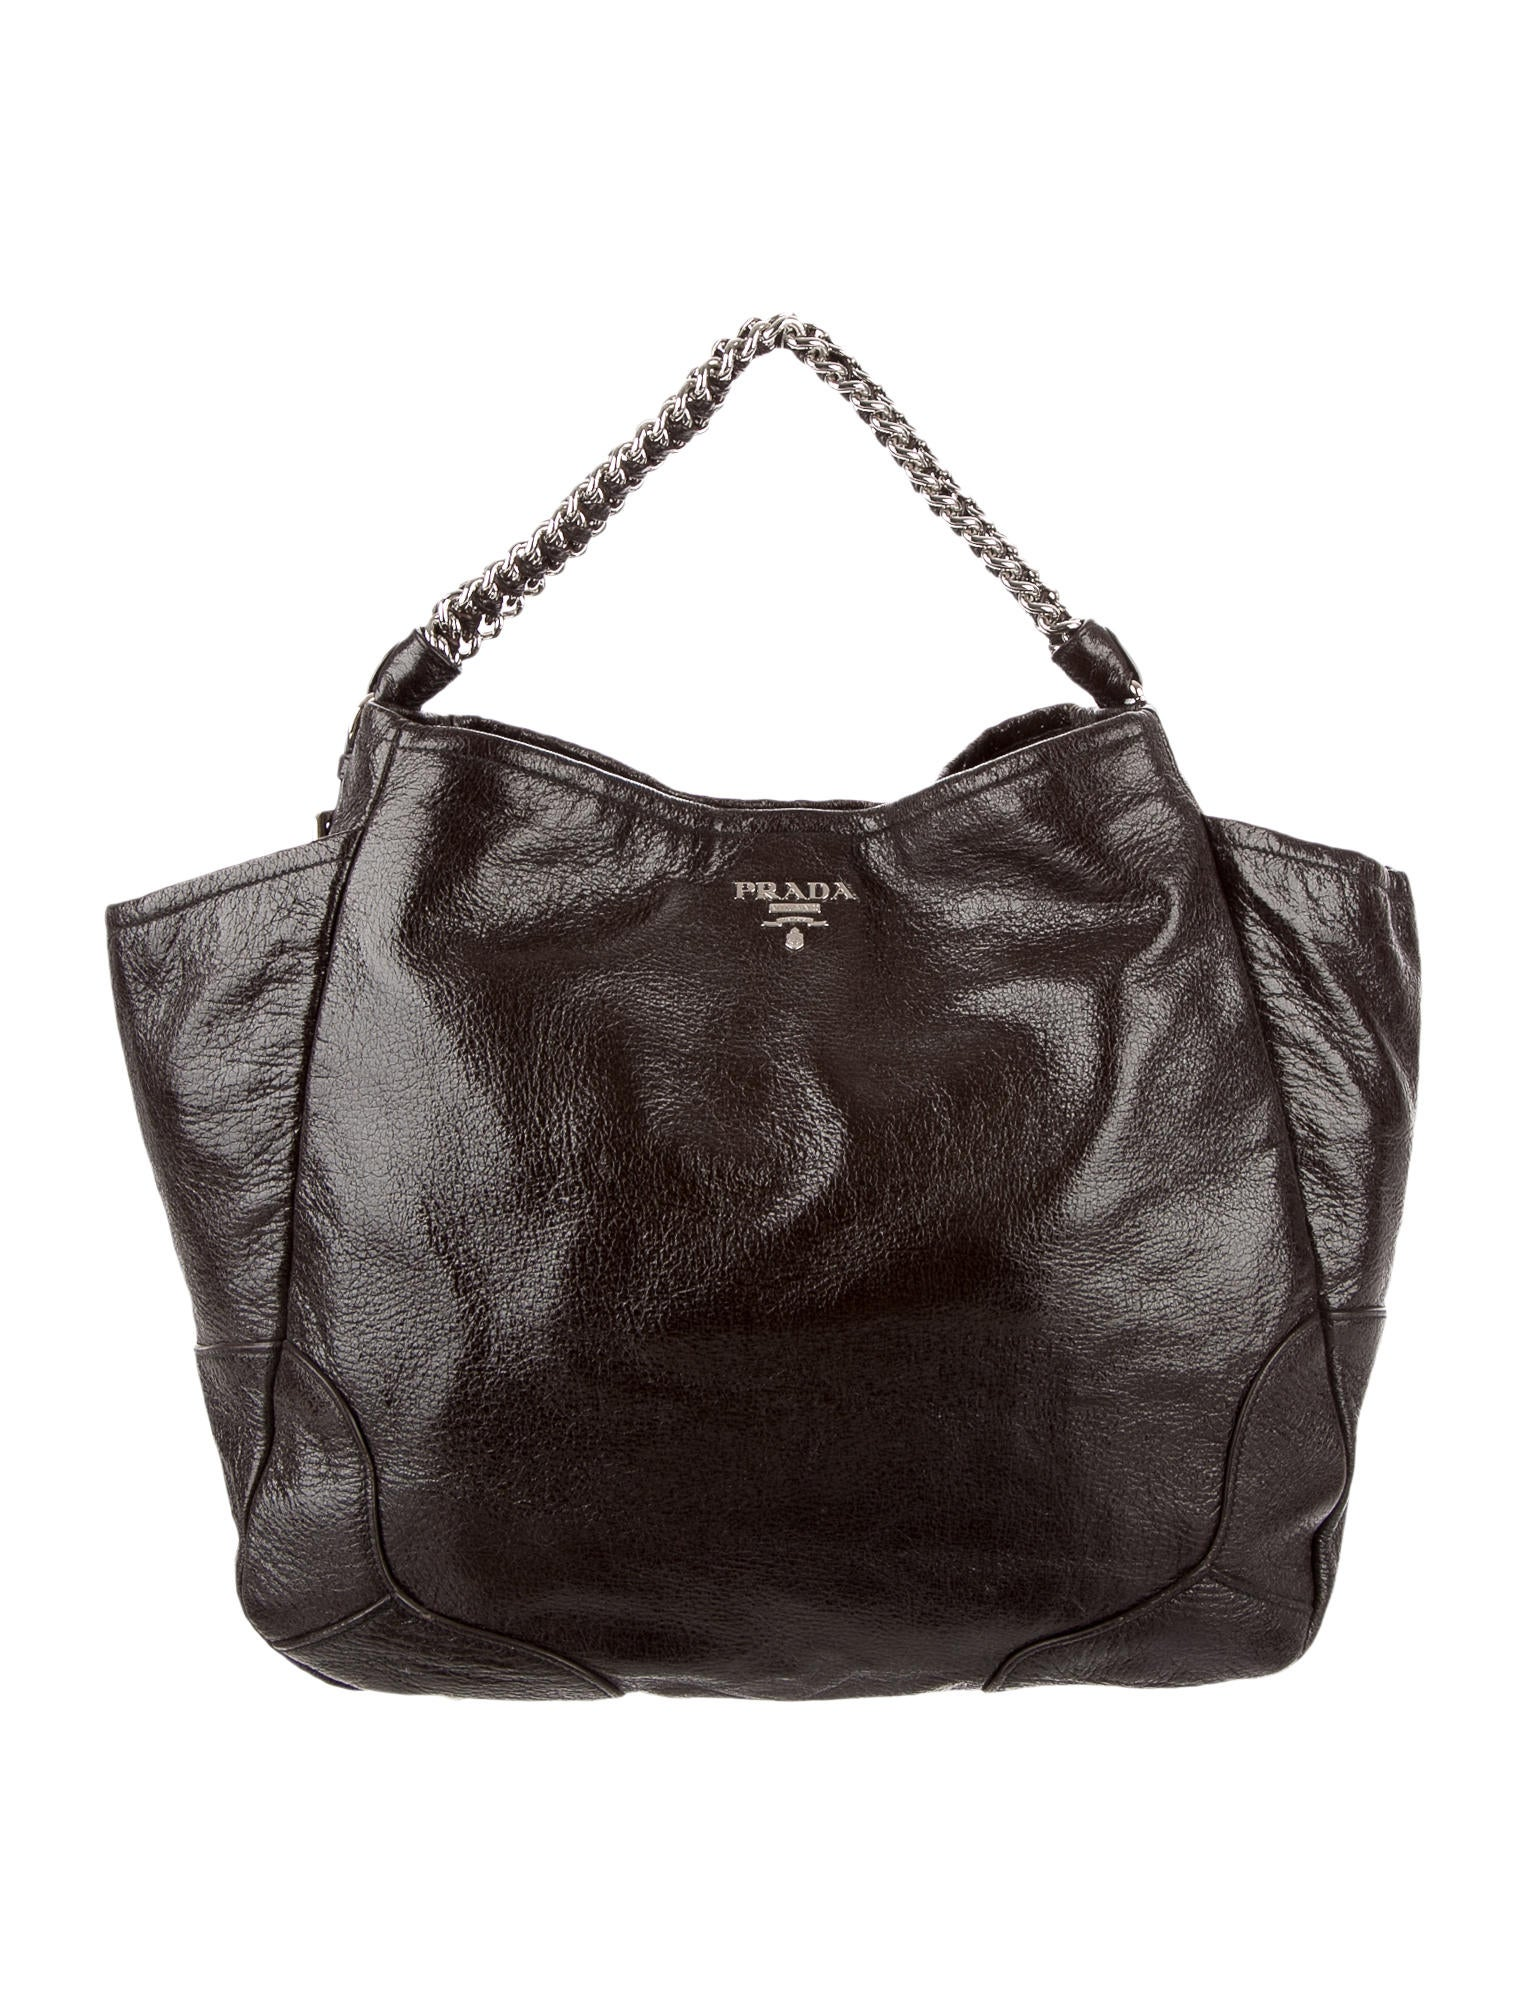 2fdfadf000f329 Prada Cervo Lux Chain Bag - Handbags - PRA79282 | The RealReal